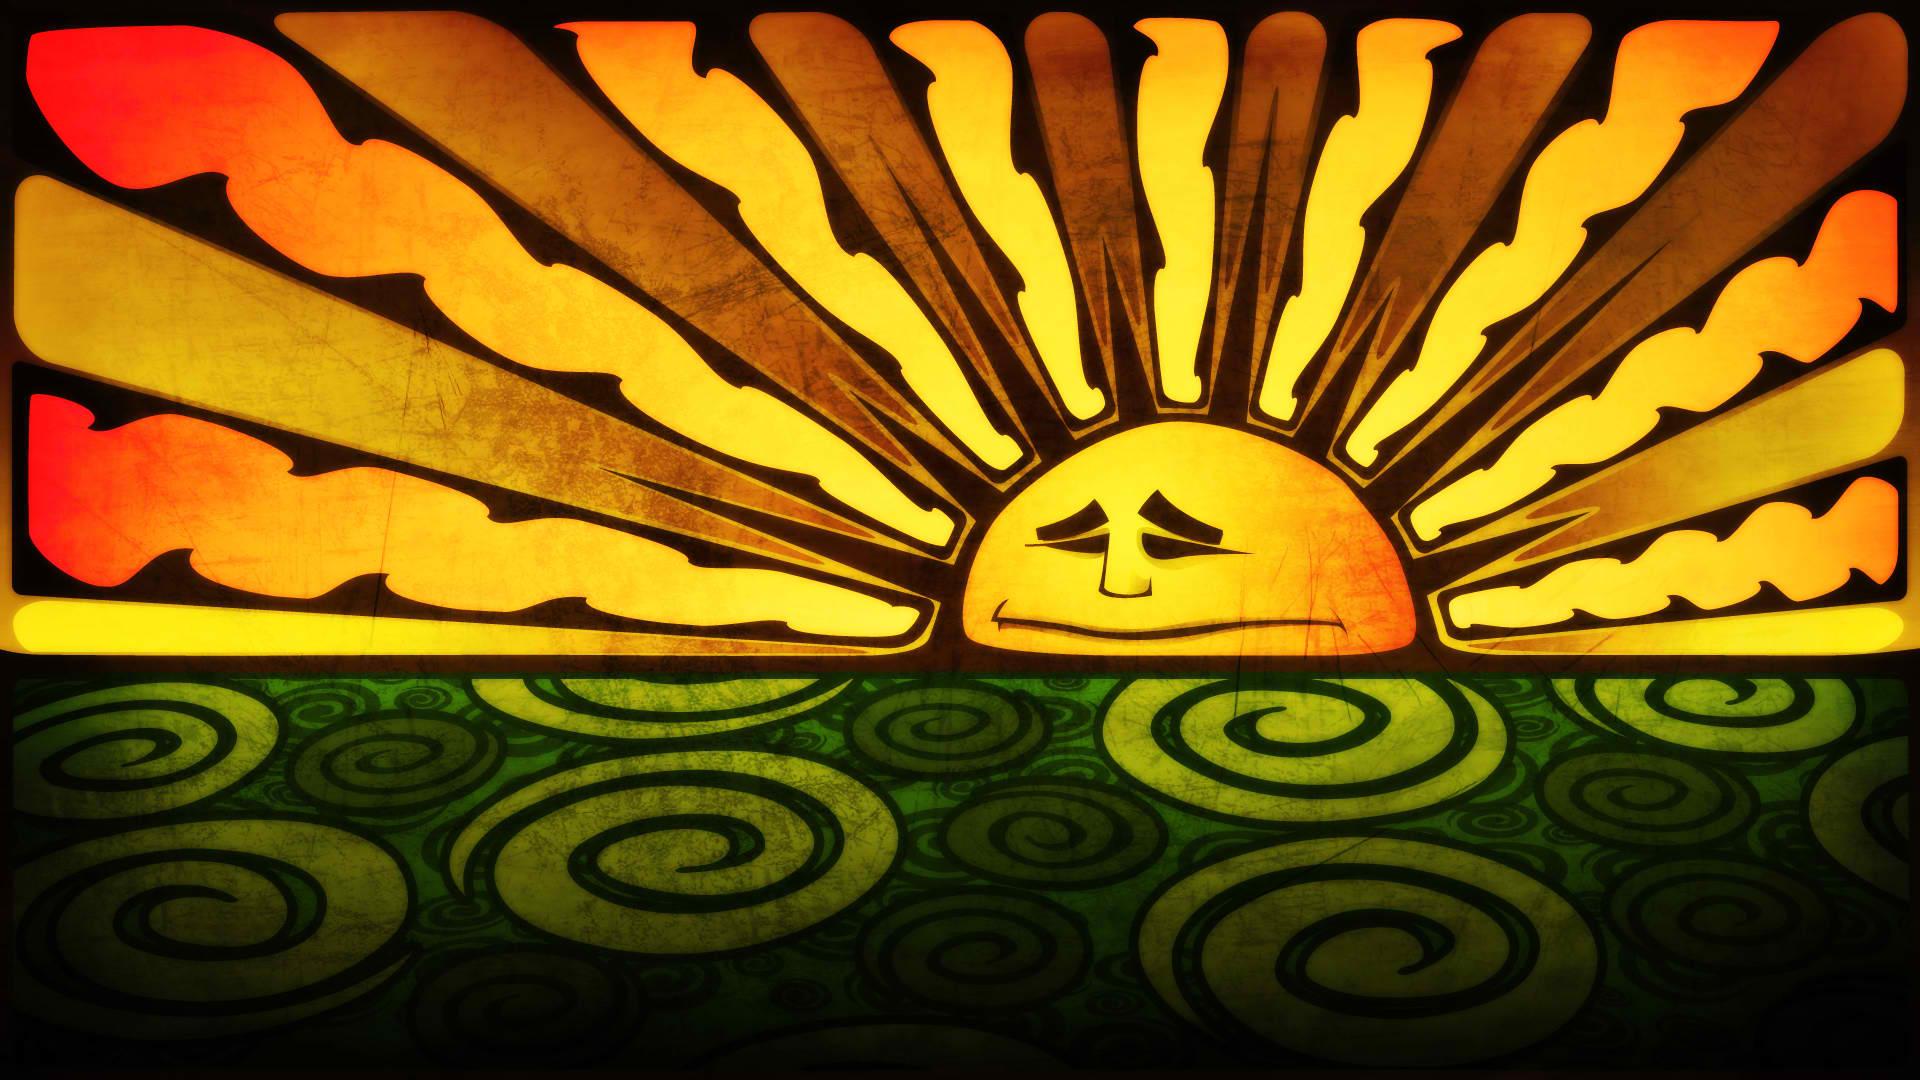 солнце, рисунок, узор